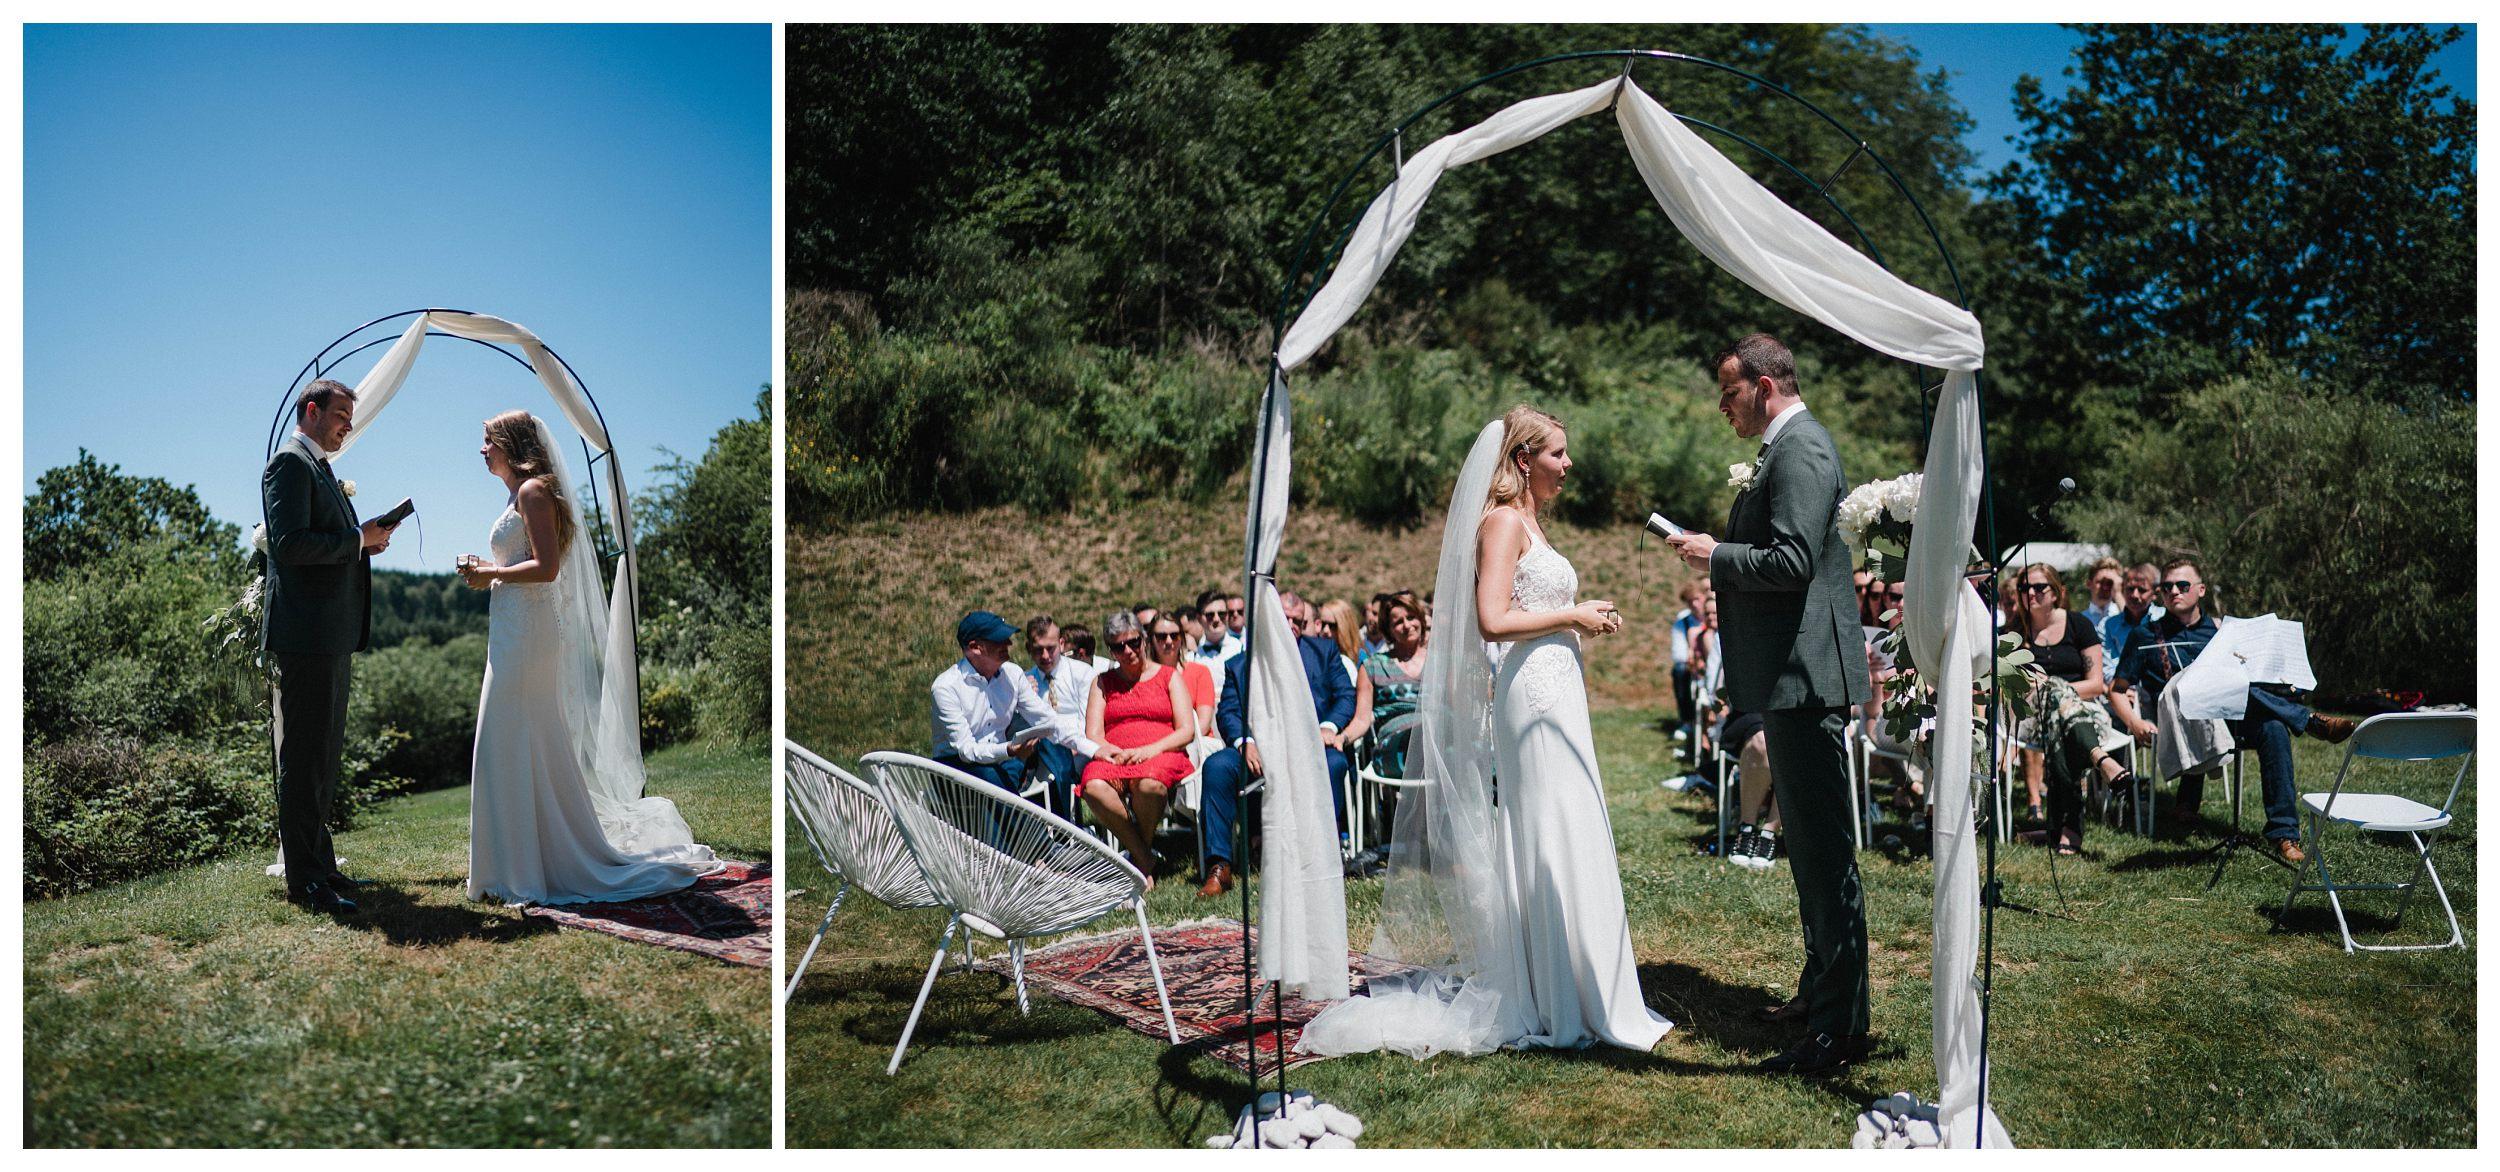 huwelijksfotograaf bruidsfotograaf destinationwedding huwelijksfotografie in ardennen nederland (68).jpg